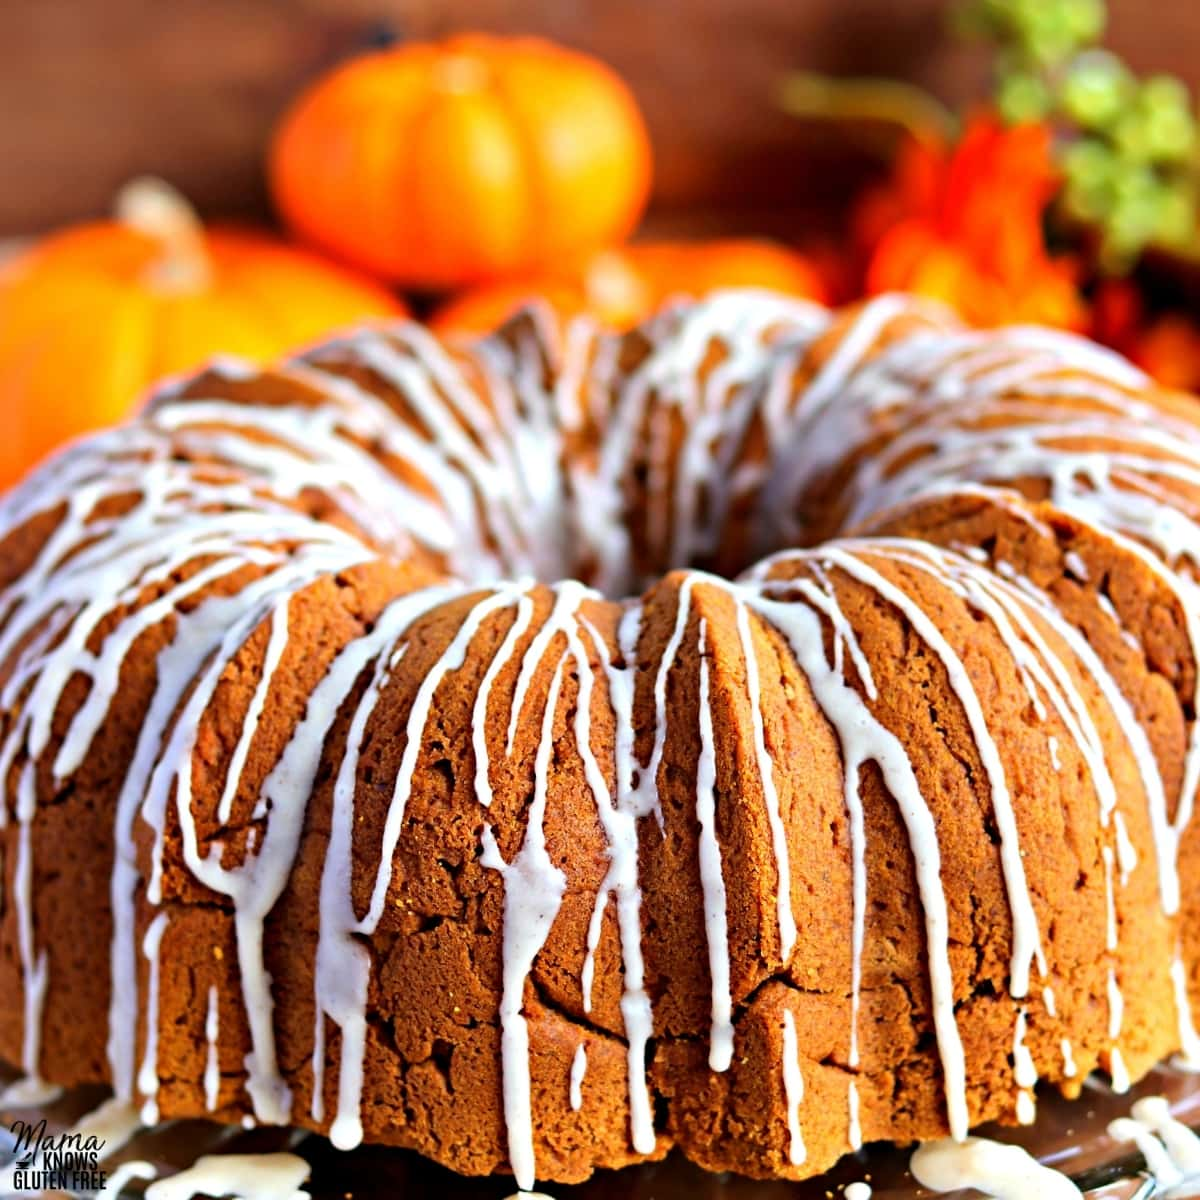 gluten-free pumpkin cake with pumpkins in the background